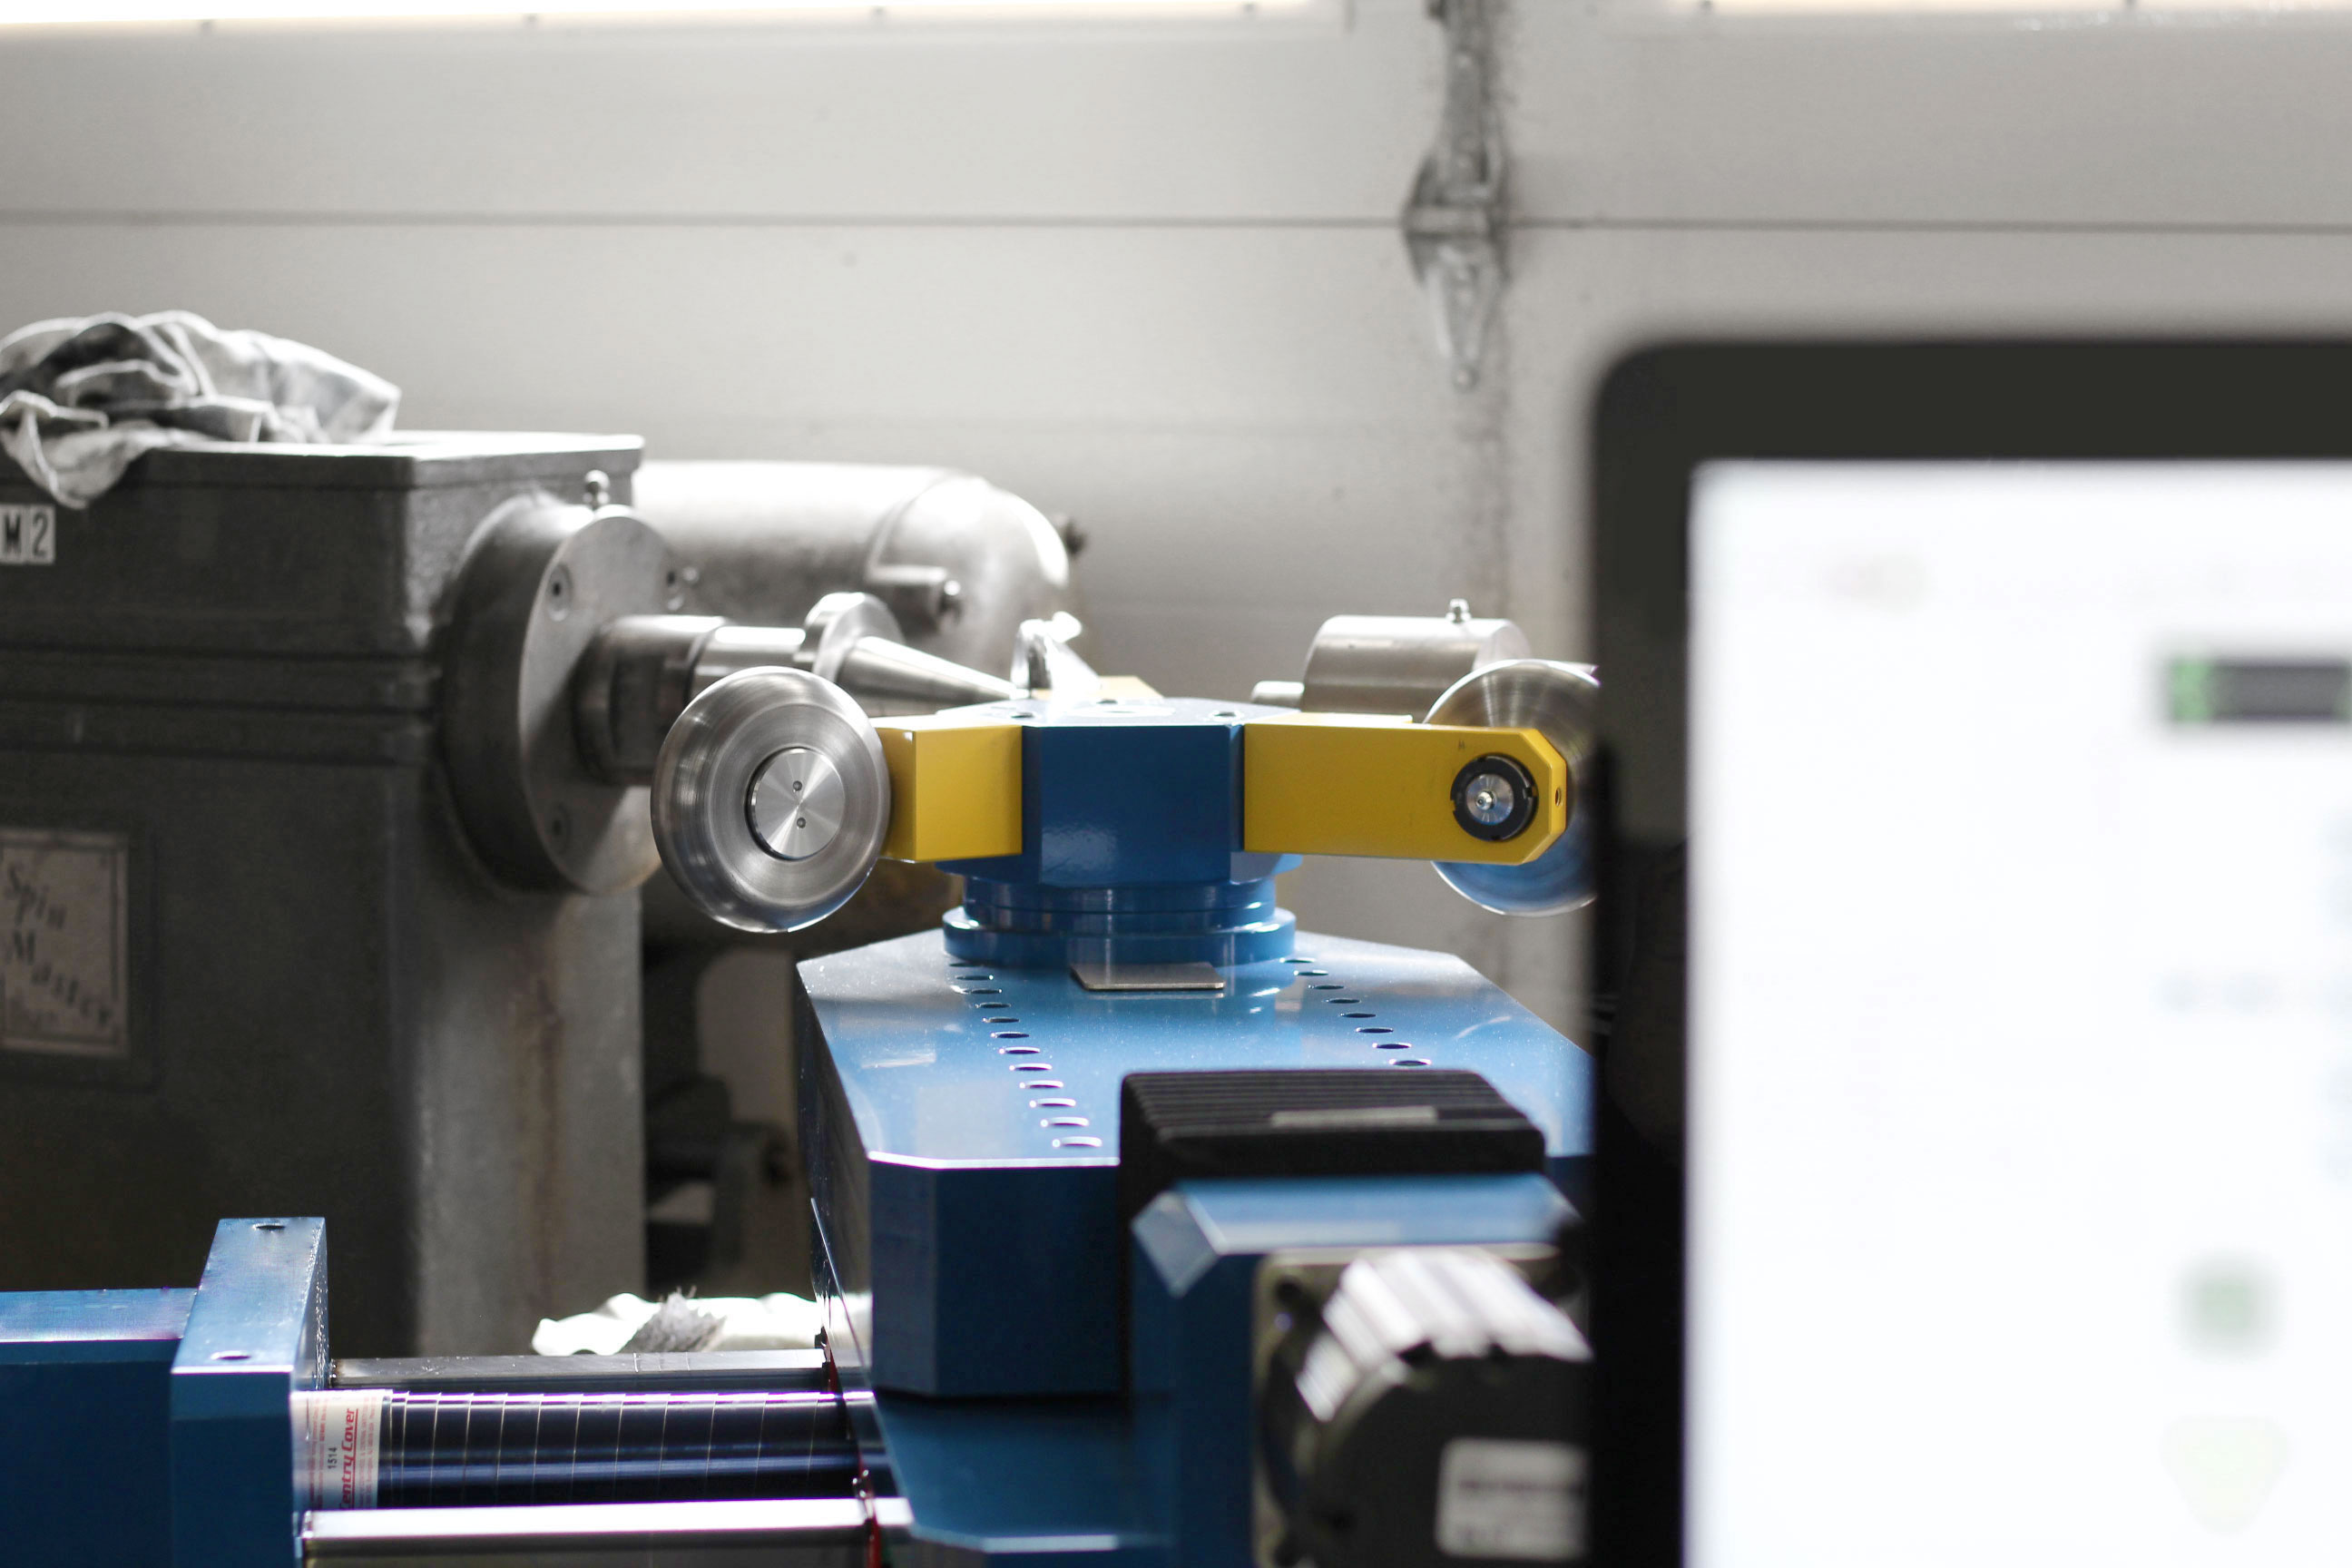 Repair hand spinning lathe rebuild CNC